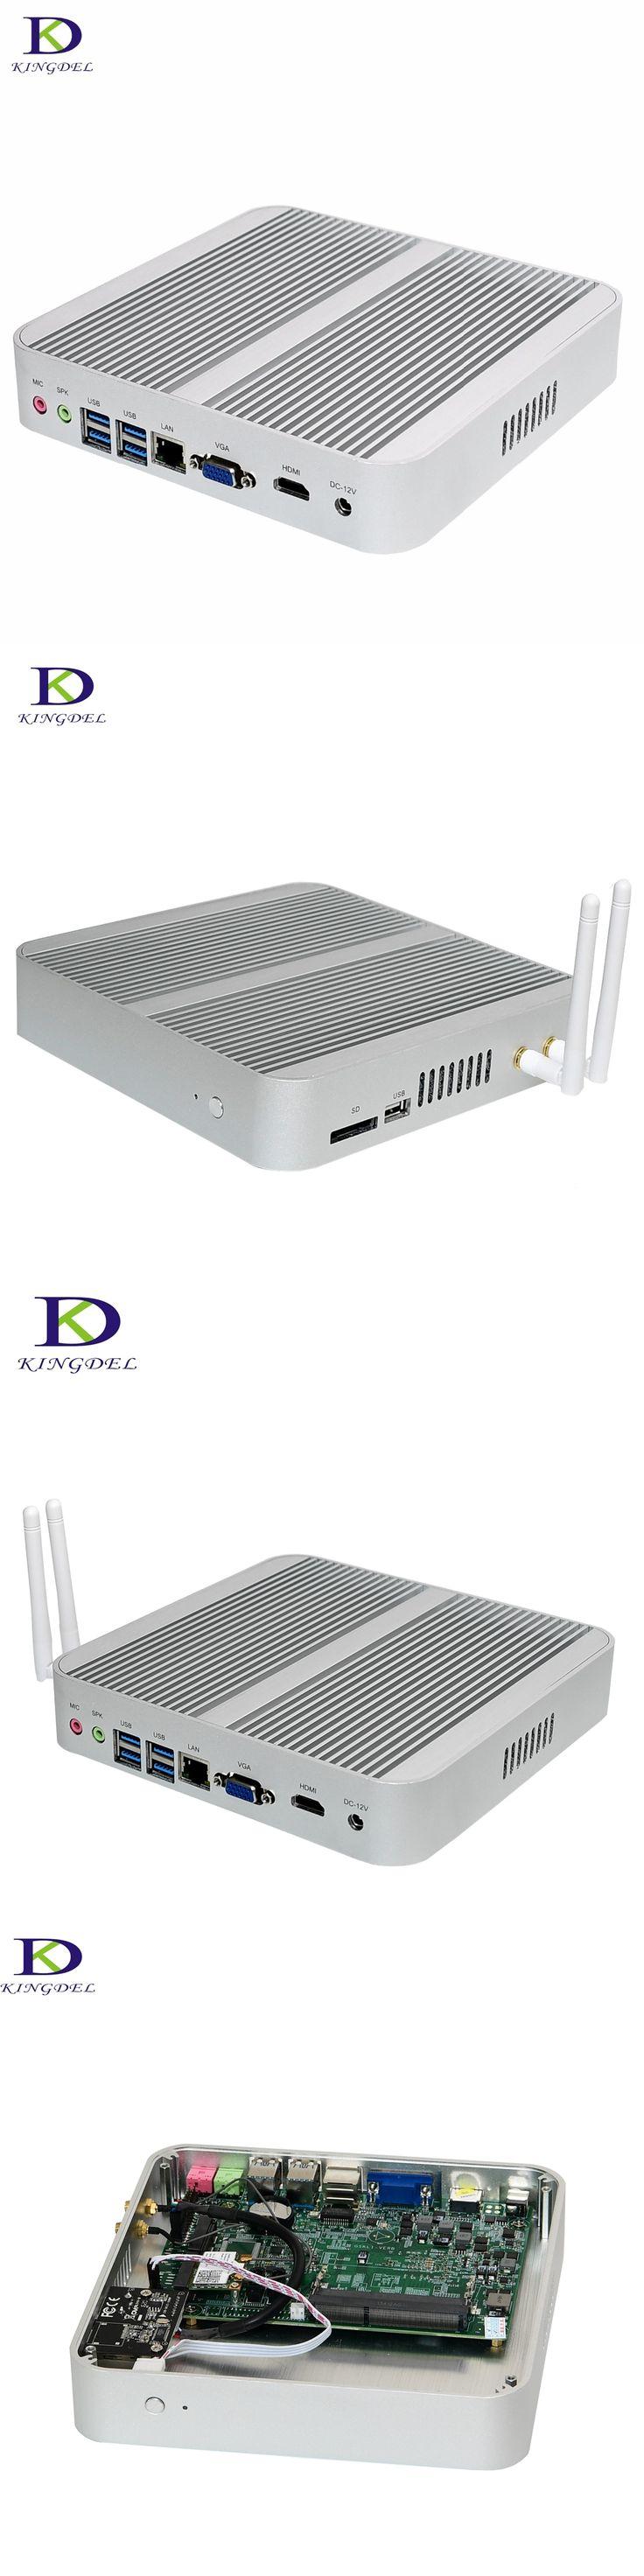 Big Promotion Intel Core i5 6260U Intel Iris Graphics 540 4*USB Fanless Mini PC Nuc computer 4MB Cache HTPC Mini Destop PC